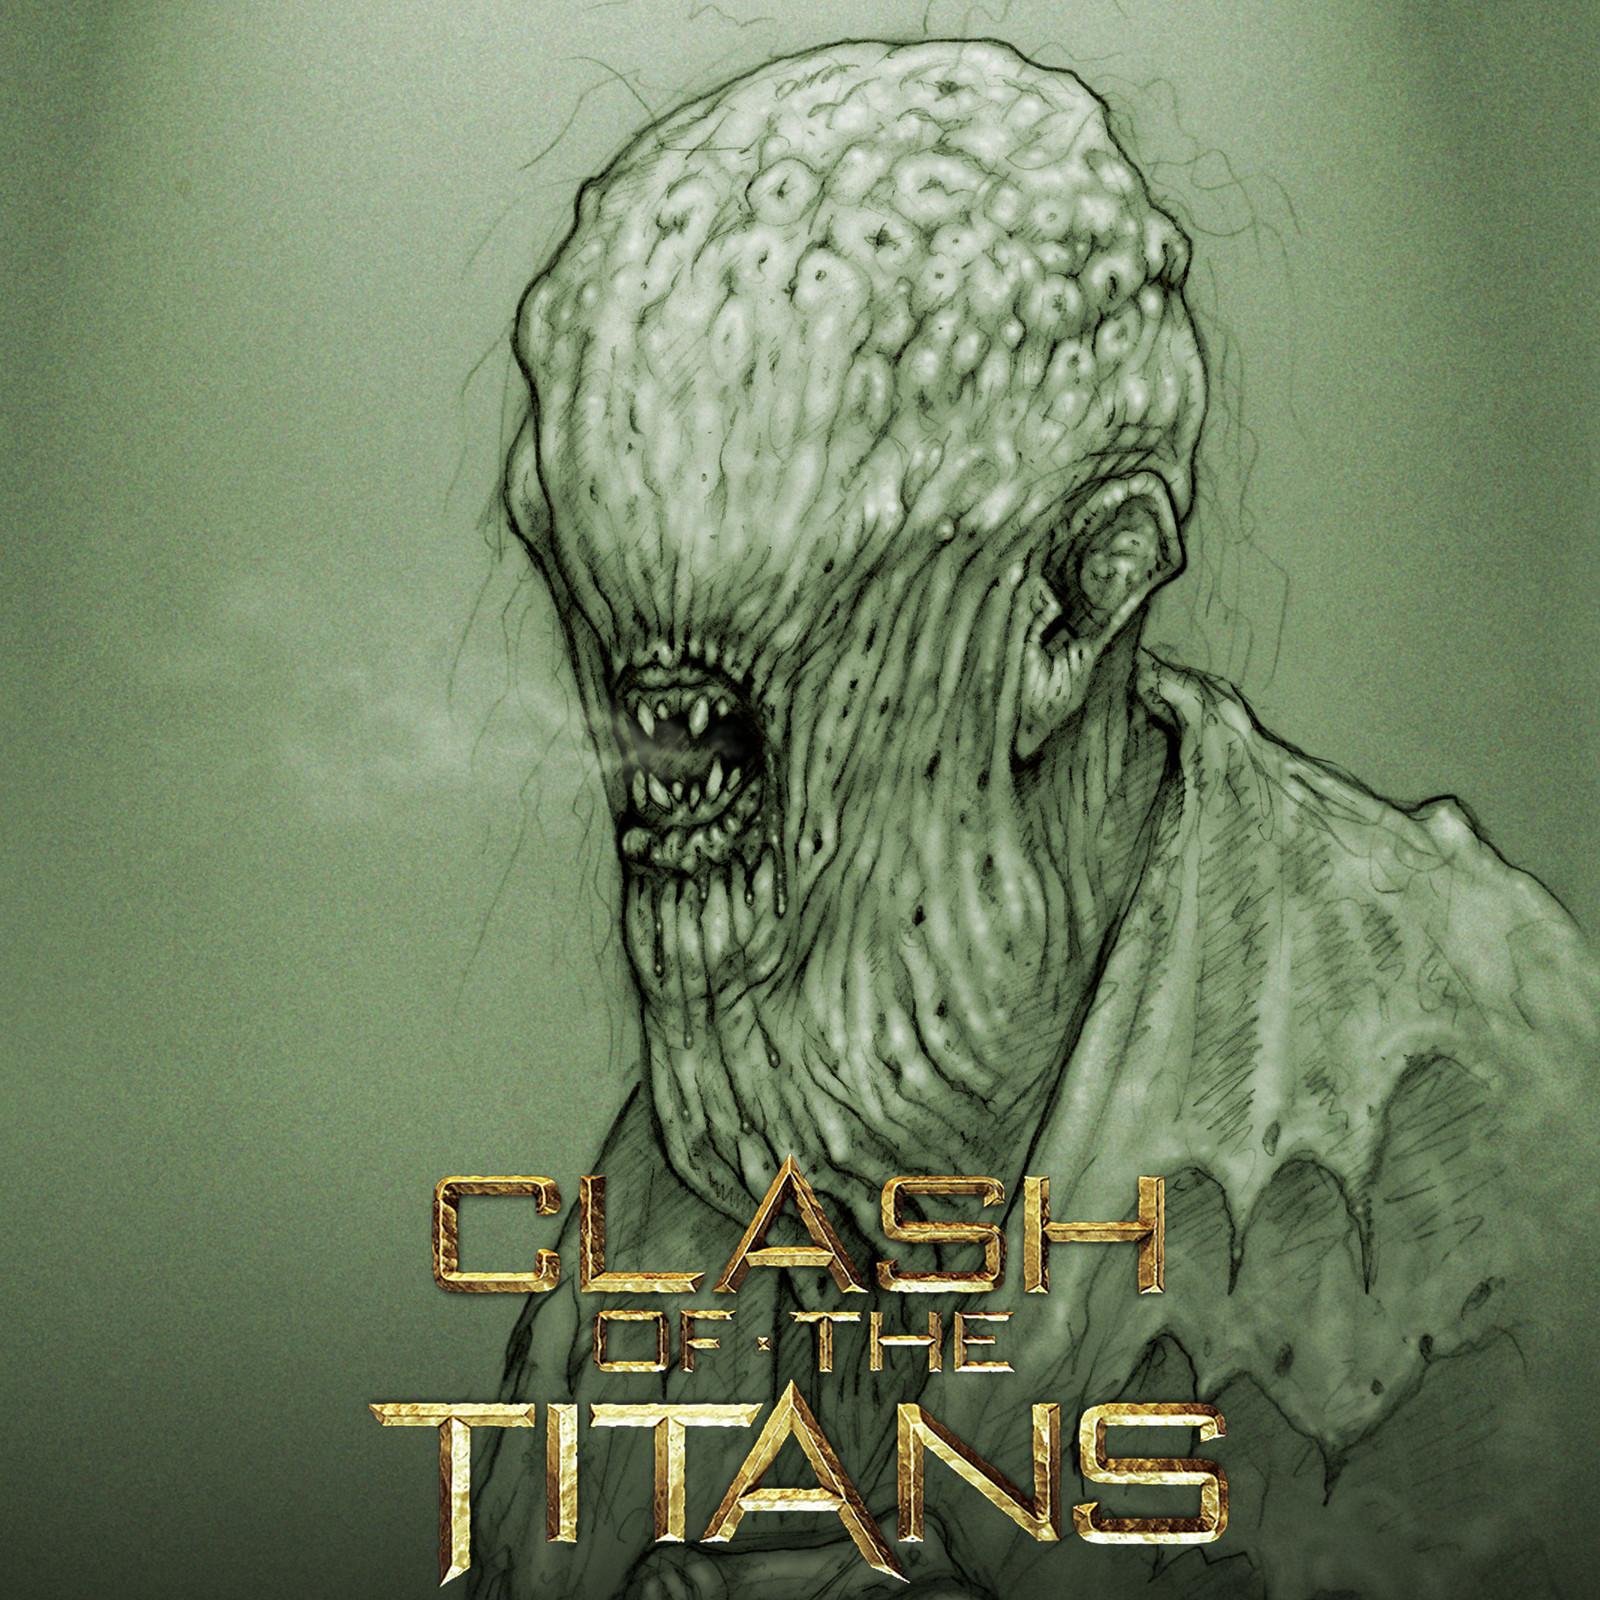 Clash of the Titans - Stygian Whitches